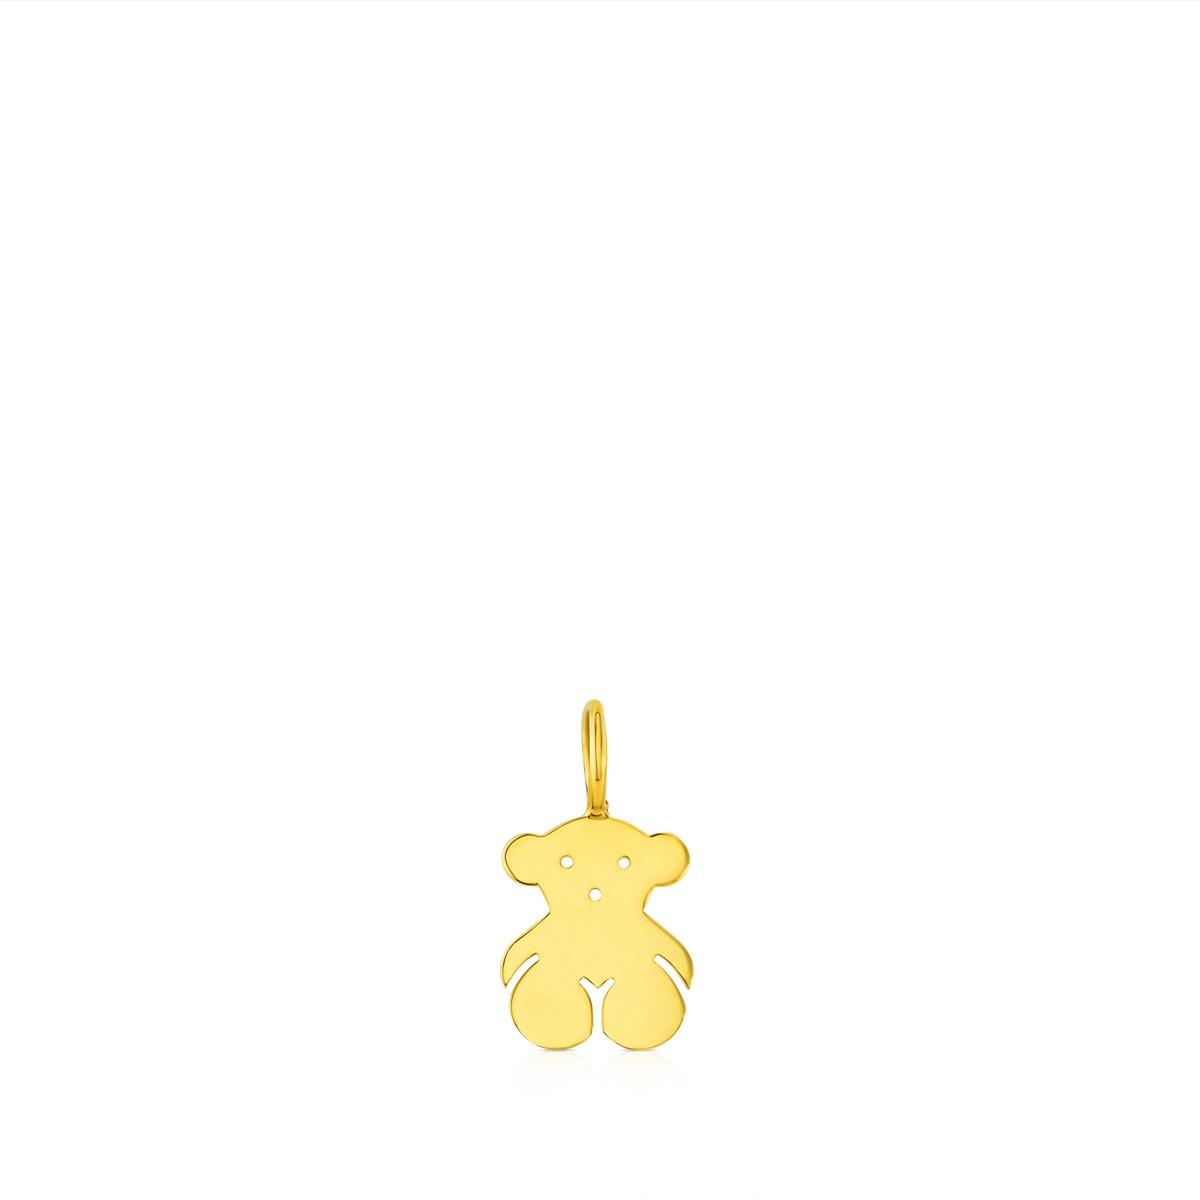 c2a664b880b7 Colgante de oro Sweet Dolls oso con anilla